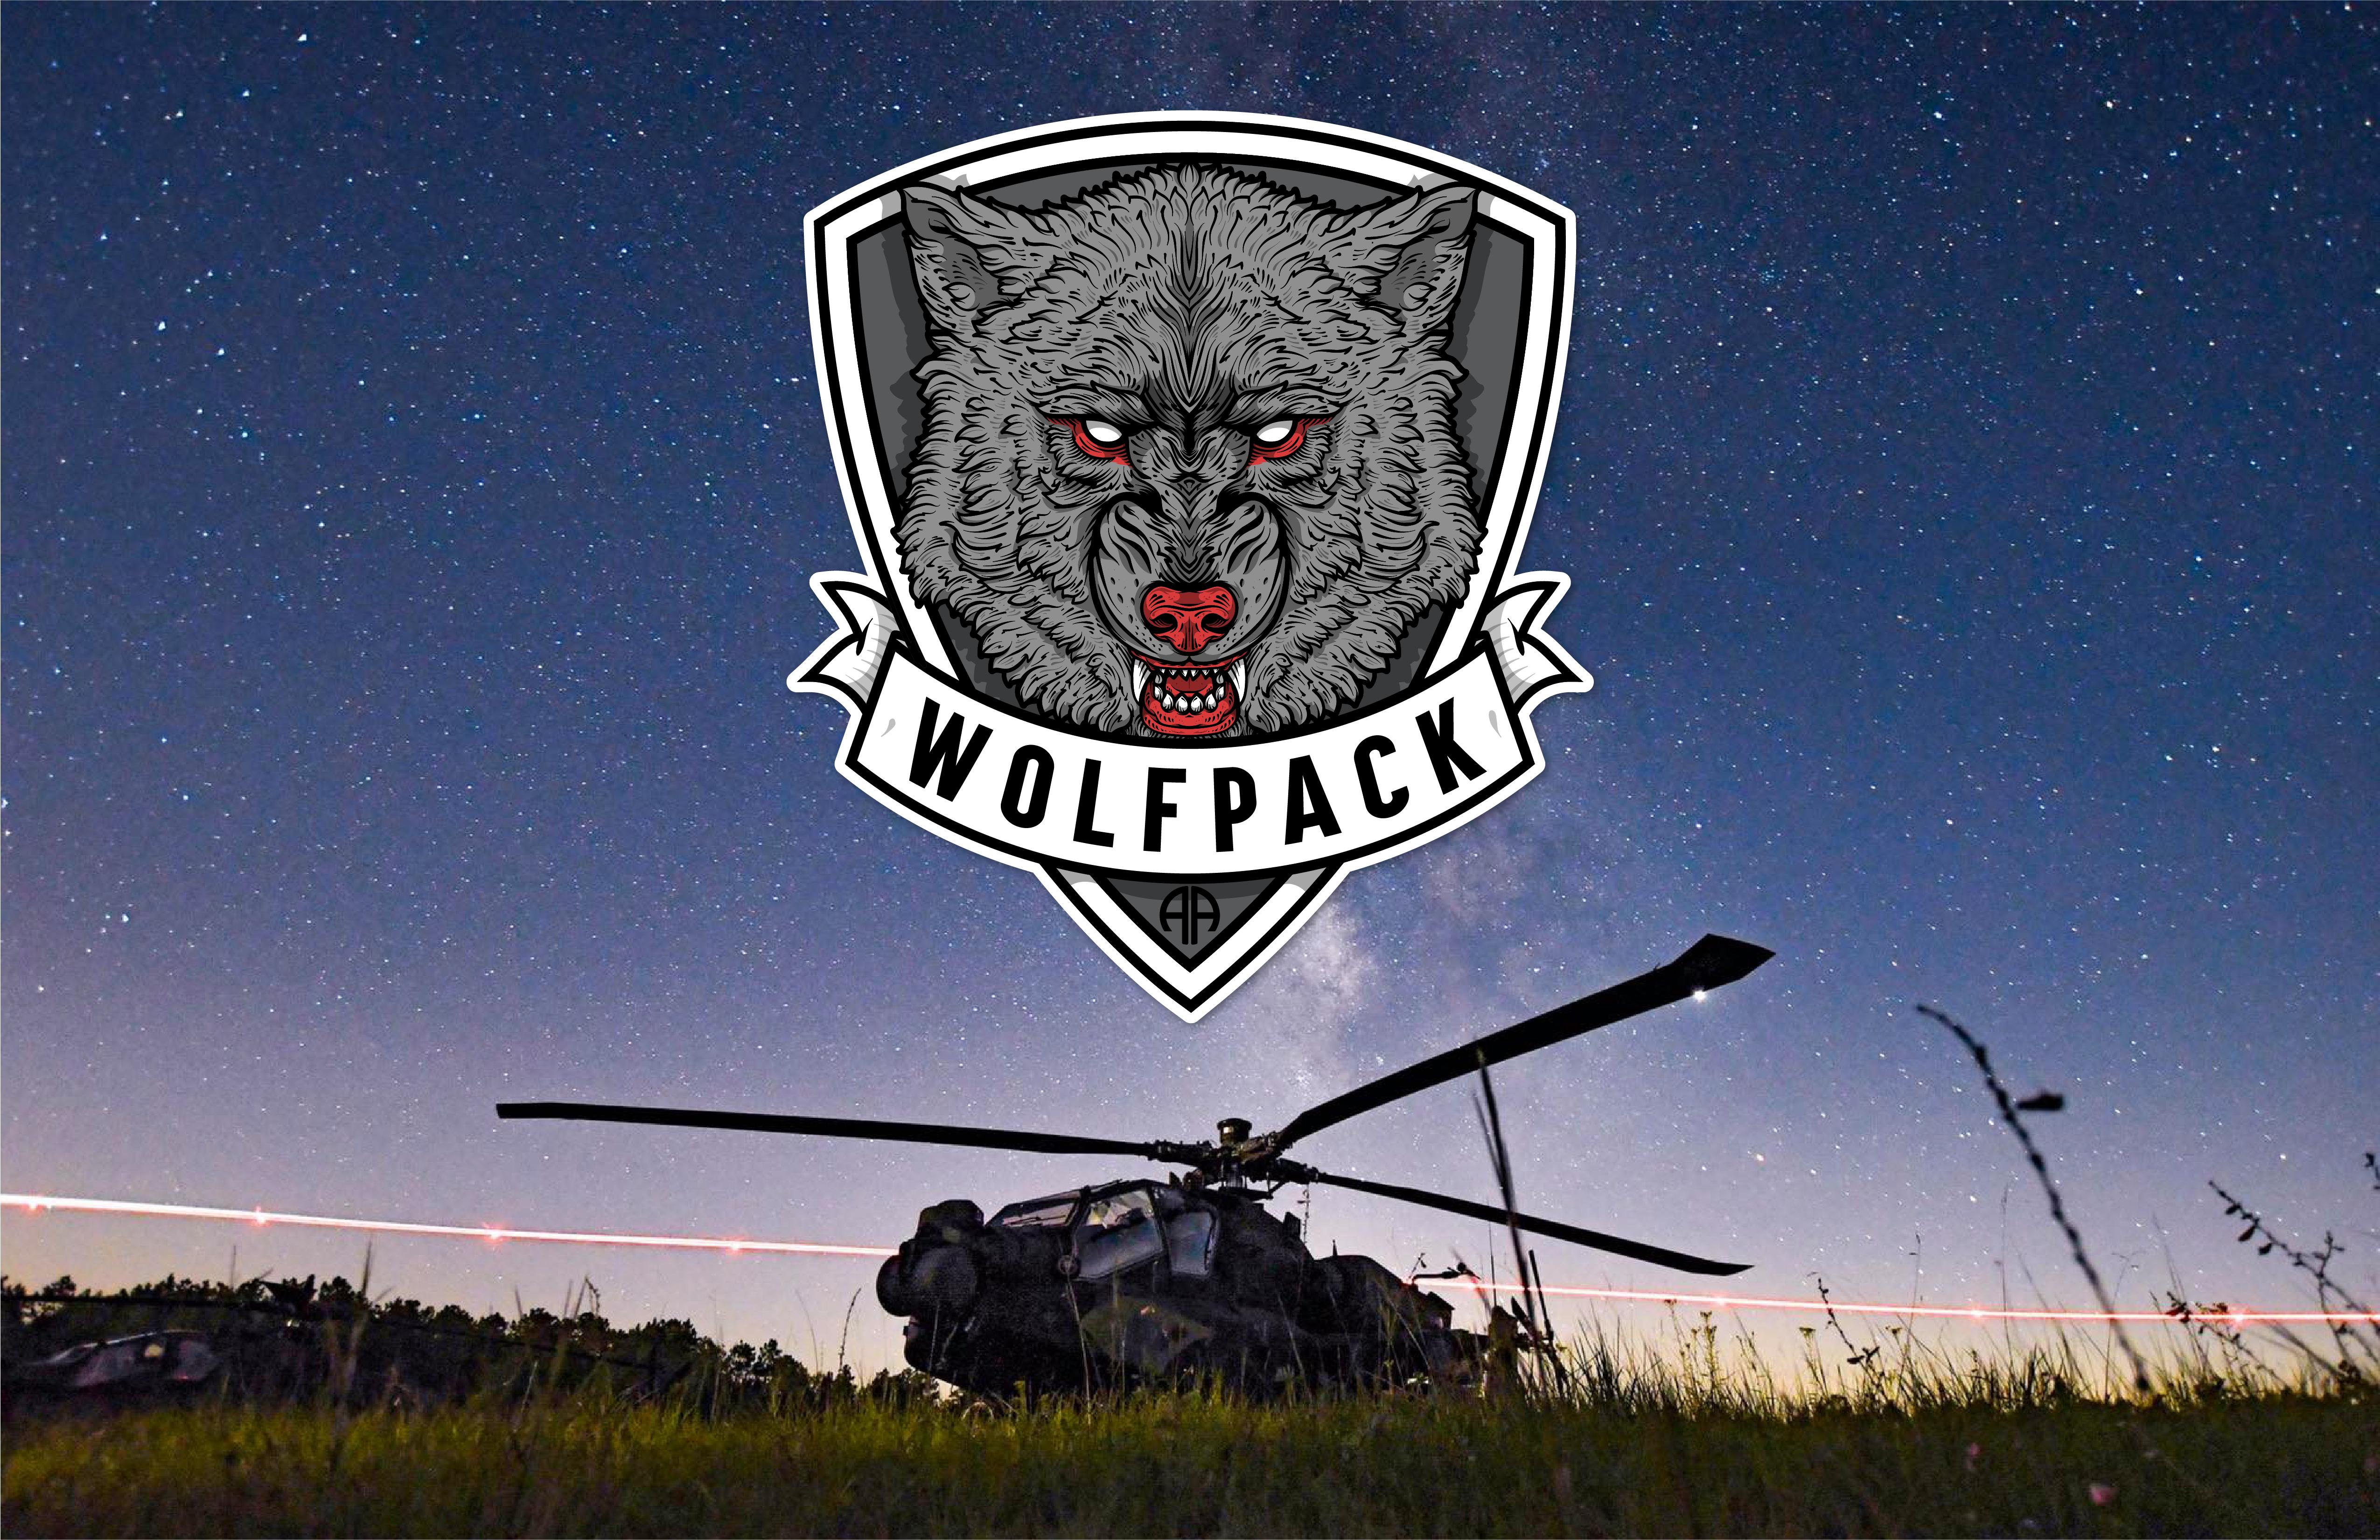 1-82 MAIN WOLFPACK DESIGN-06